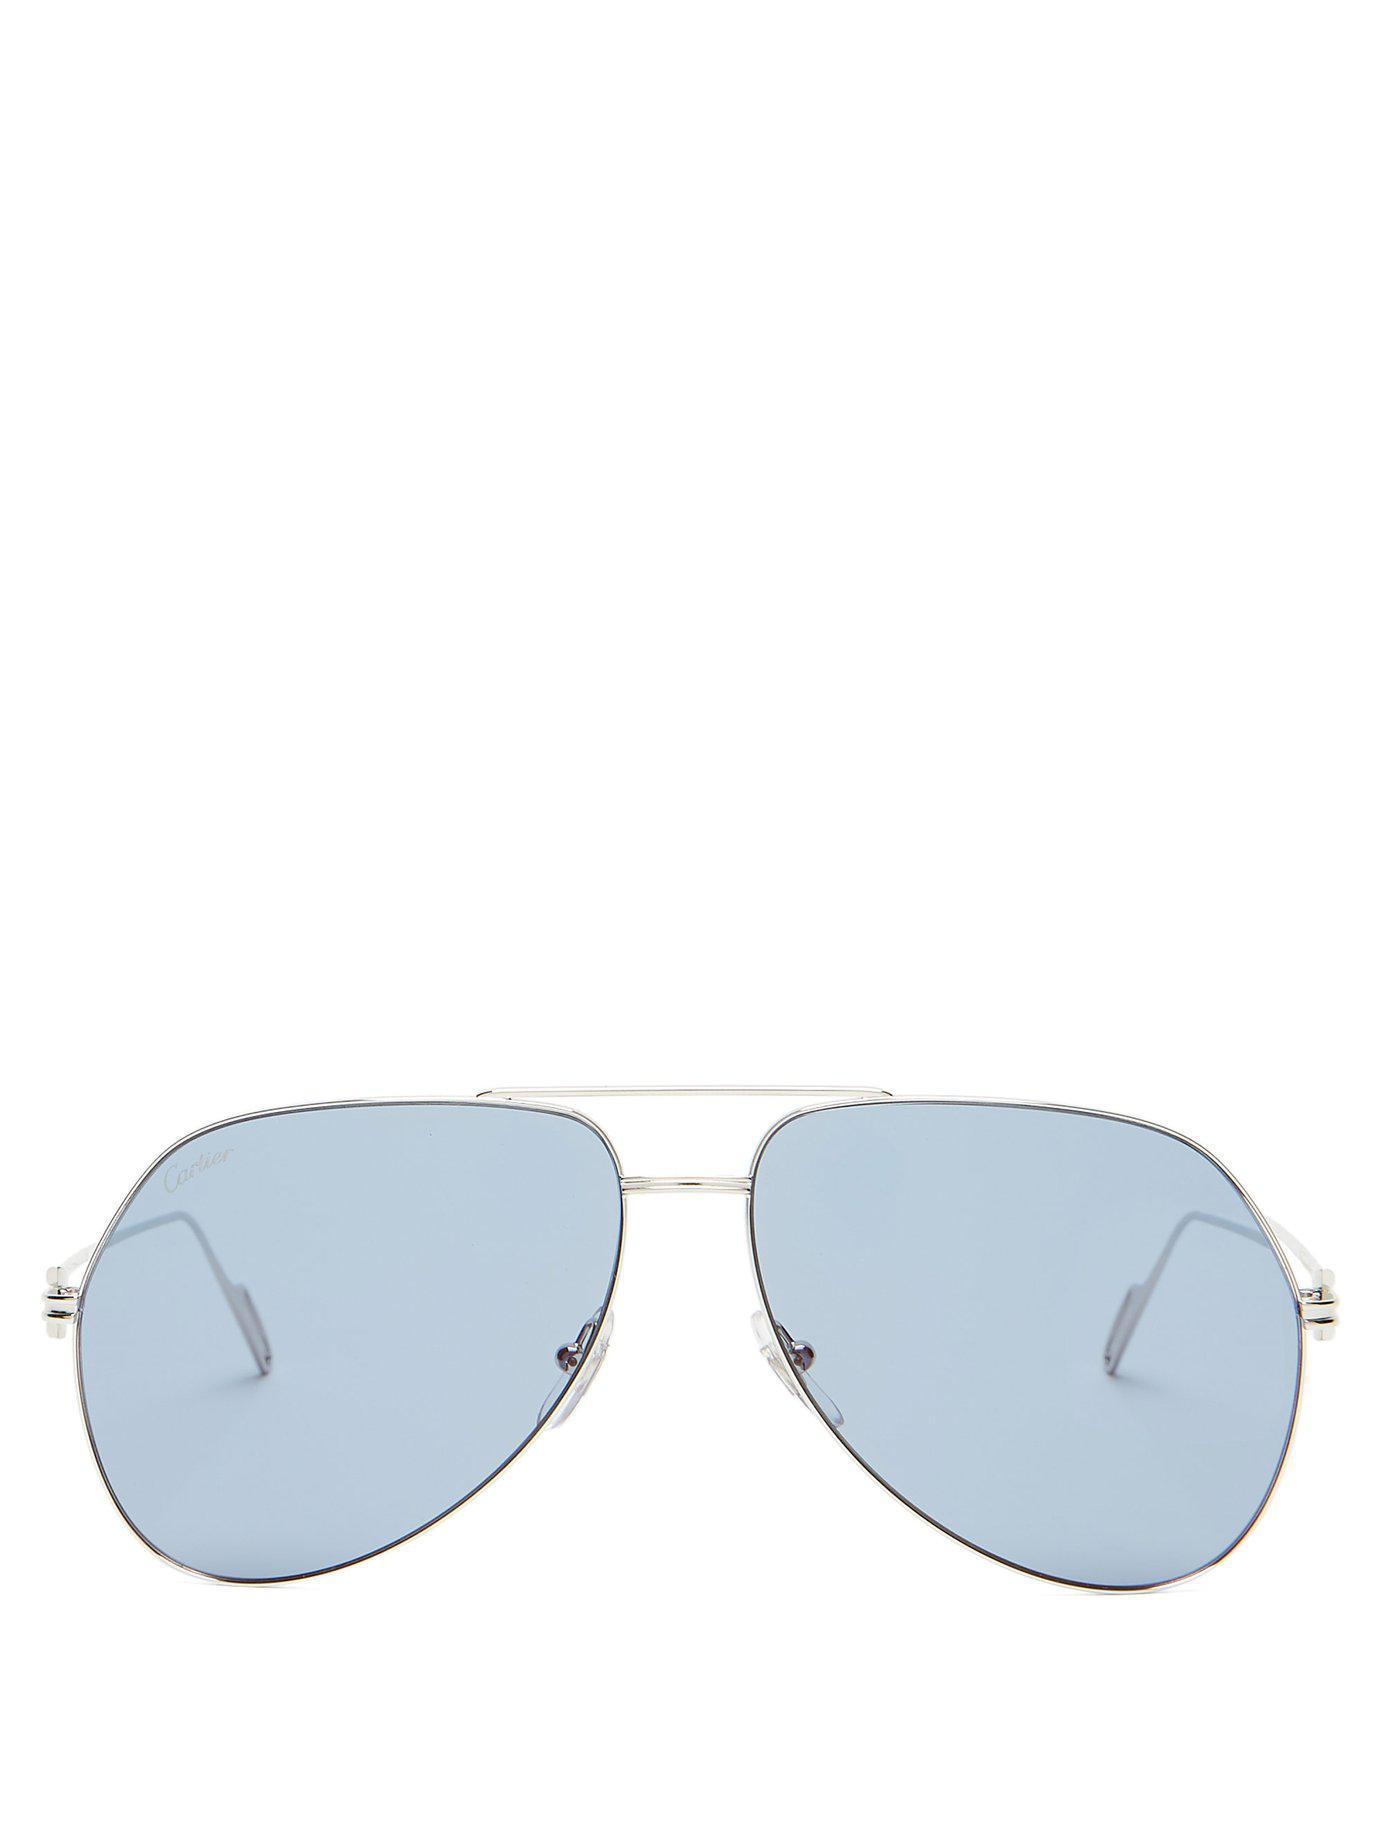 8f2e04762e2 Cartier. Women s Metallic Première De Cartier Silver Tone Metal Sunglasses